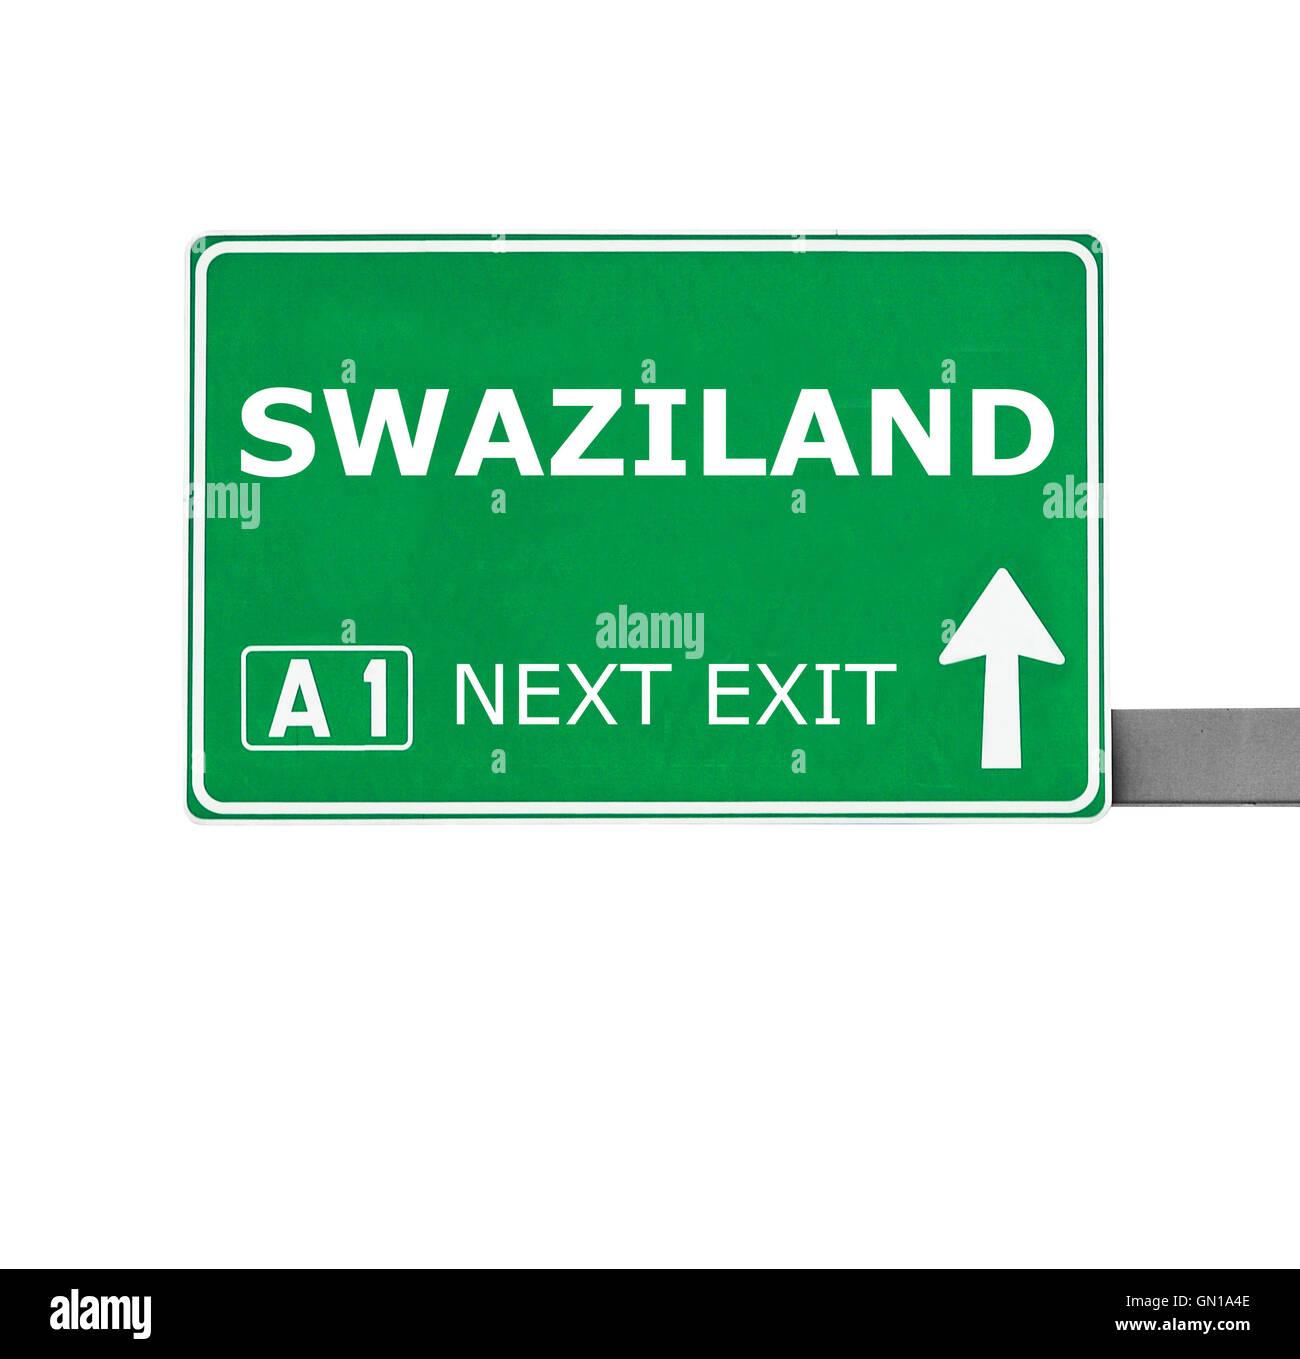 SWAZILAND Sroad sign isolated on white Stock Photo